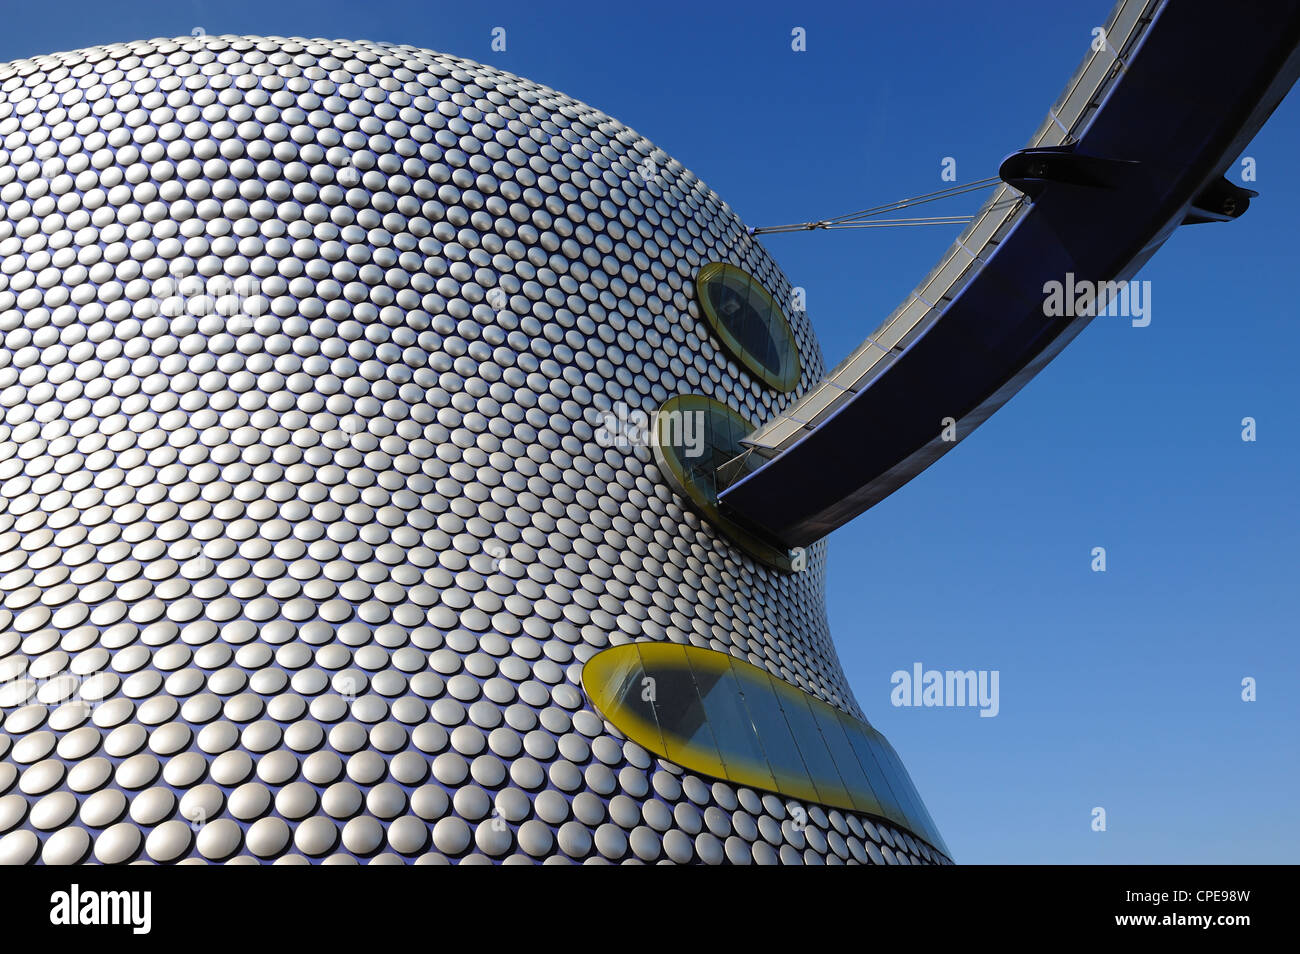 Selfridges Store exterior, Bullring Shopping Centre, Birmingham, West Midlands, England, United Kingdom, Europe - Stock Image